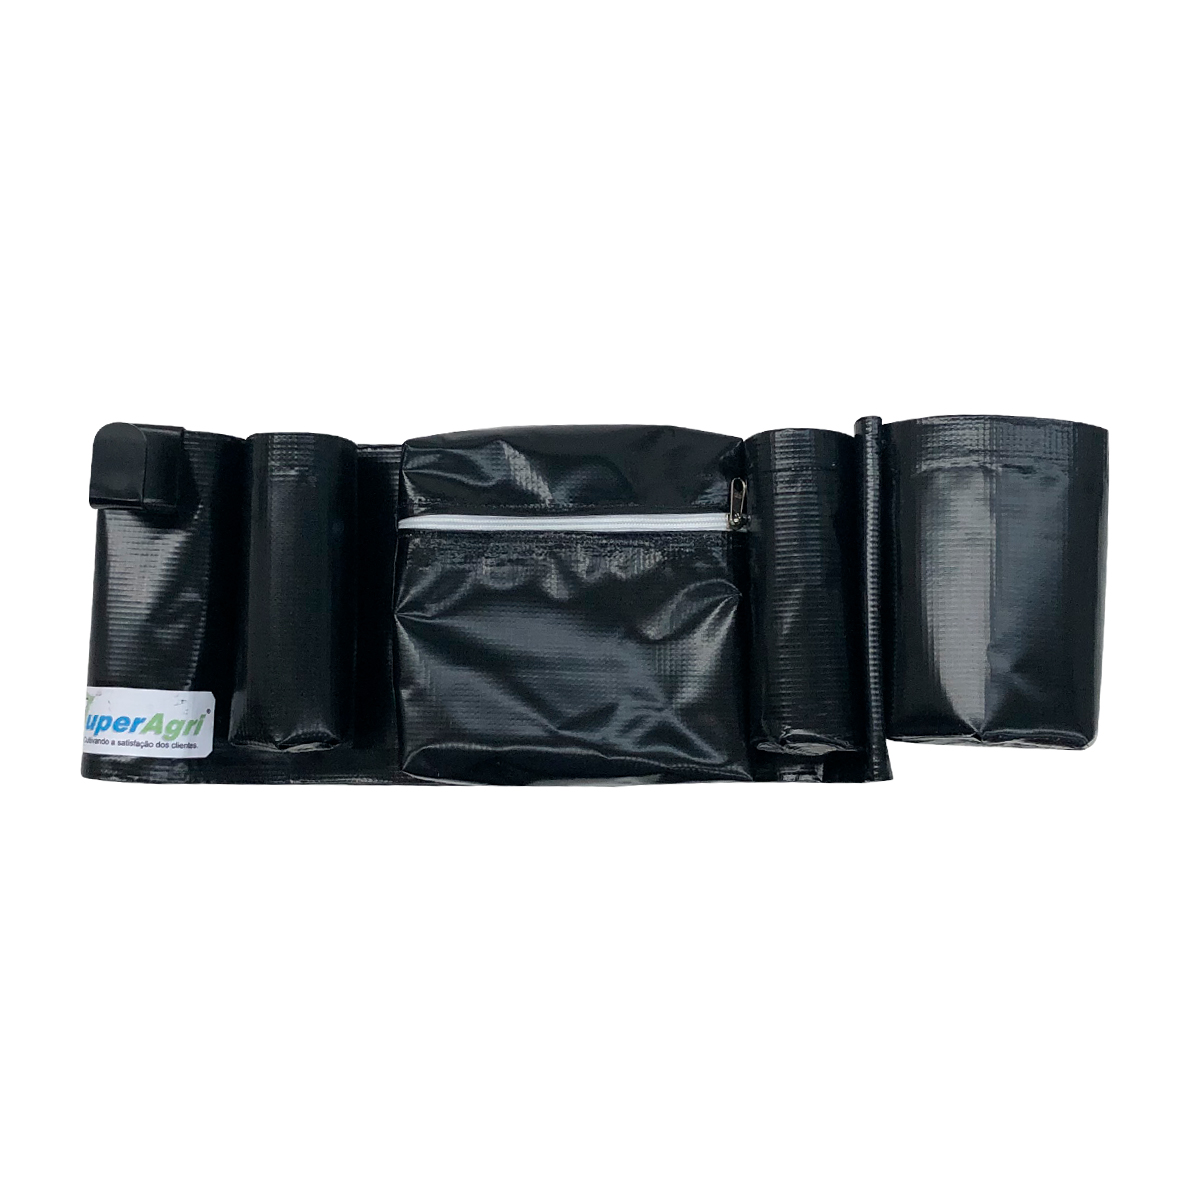 Super Lavadora Multiuso 12 Litros 100psi + Lavanda 1 Litro + Bolsa 18 à 36 + Pulverizador Garrafa Pet + Cinto